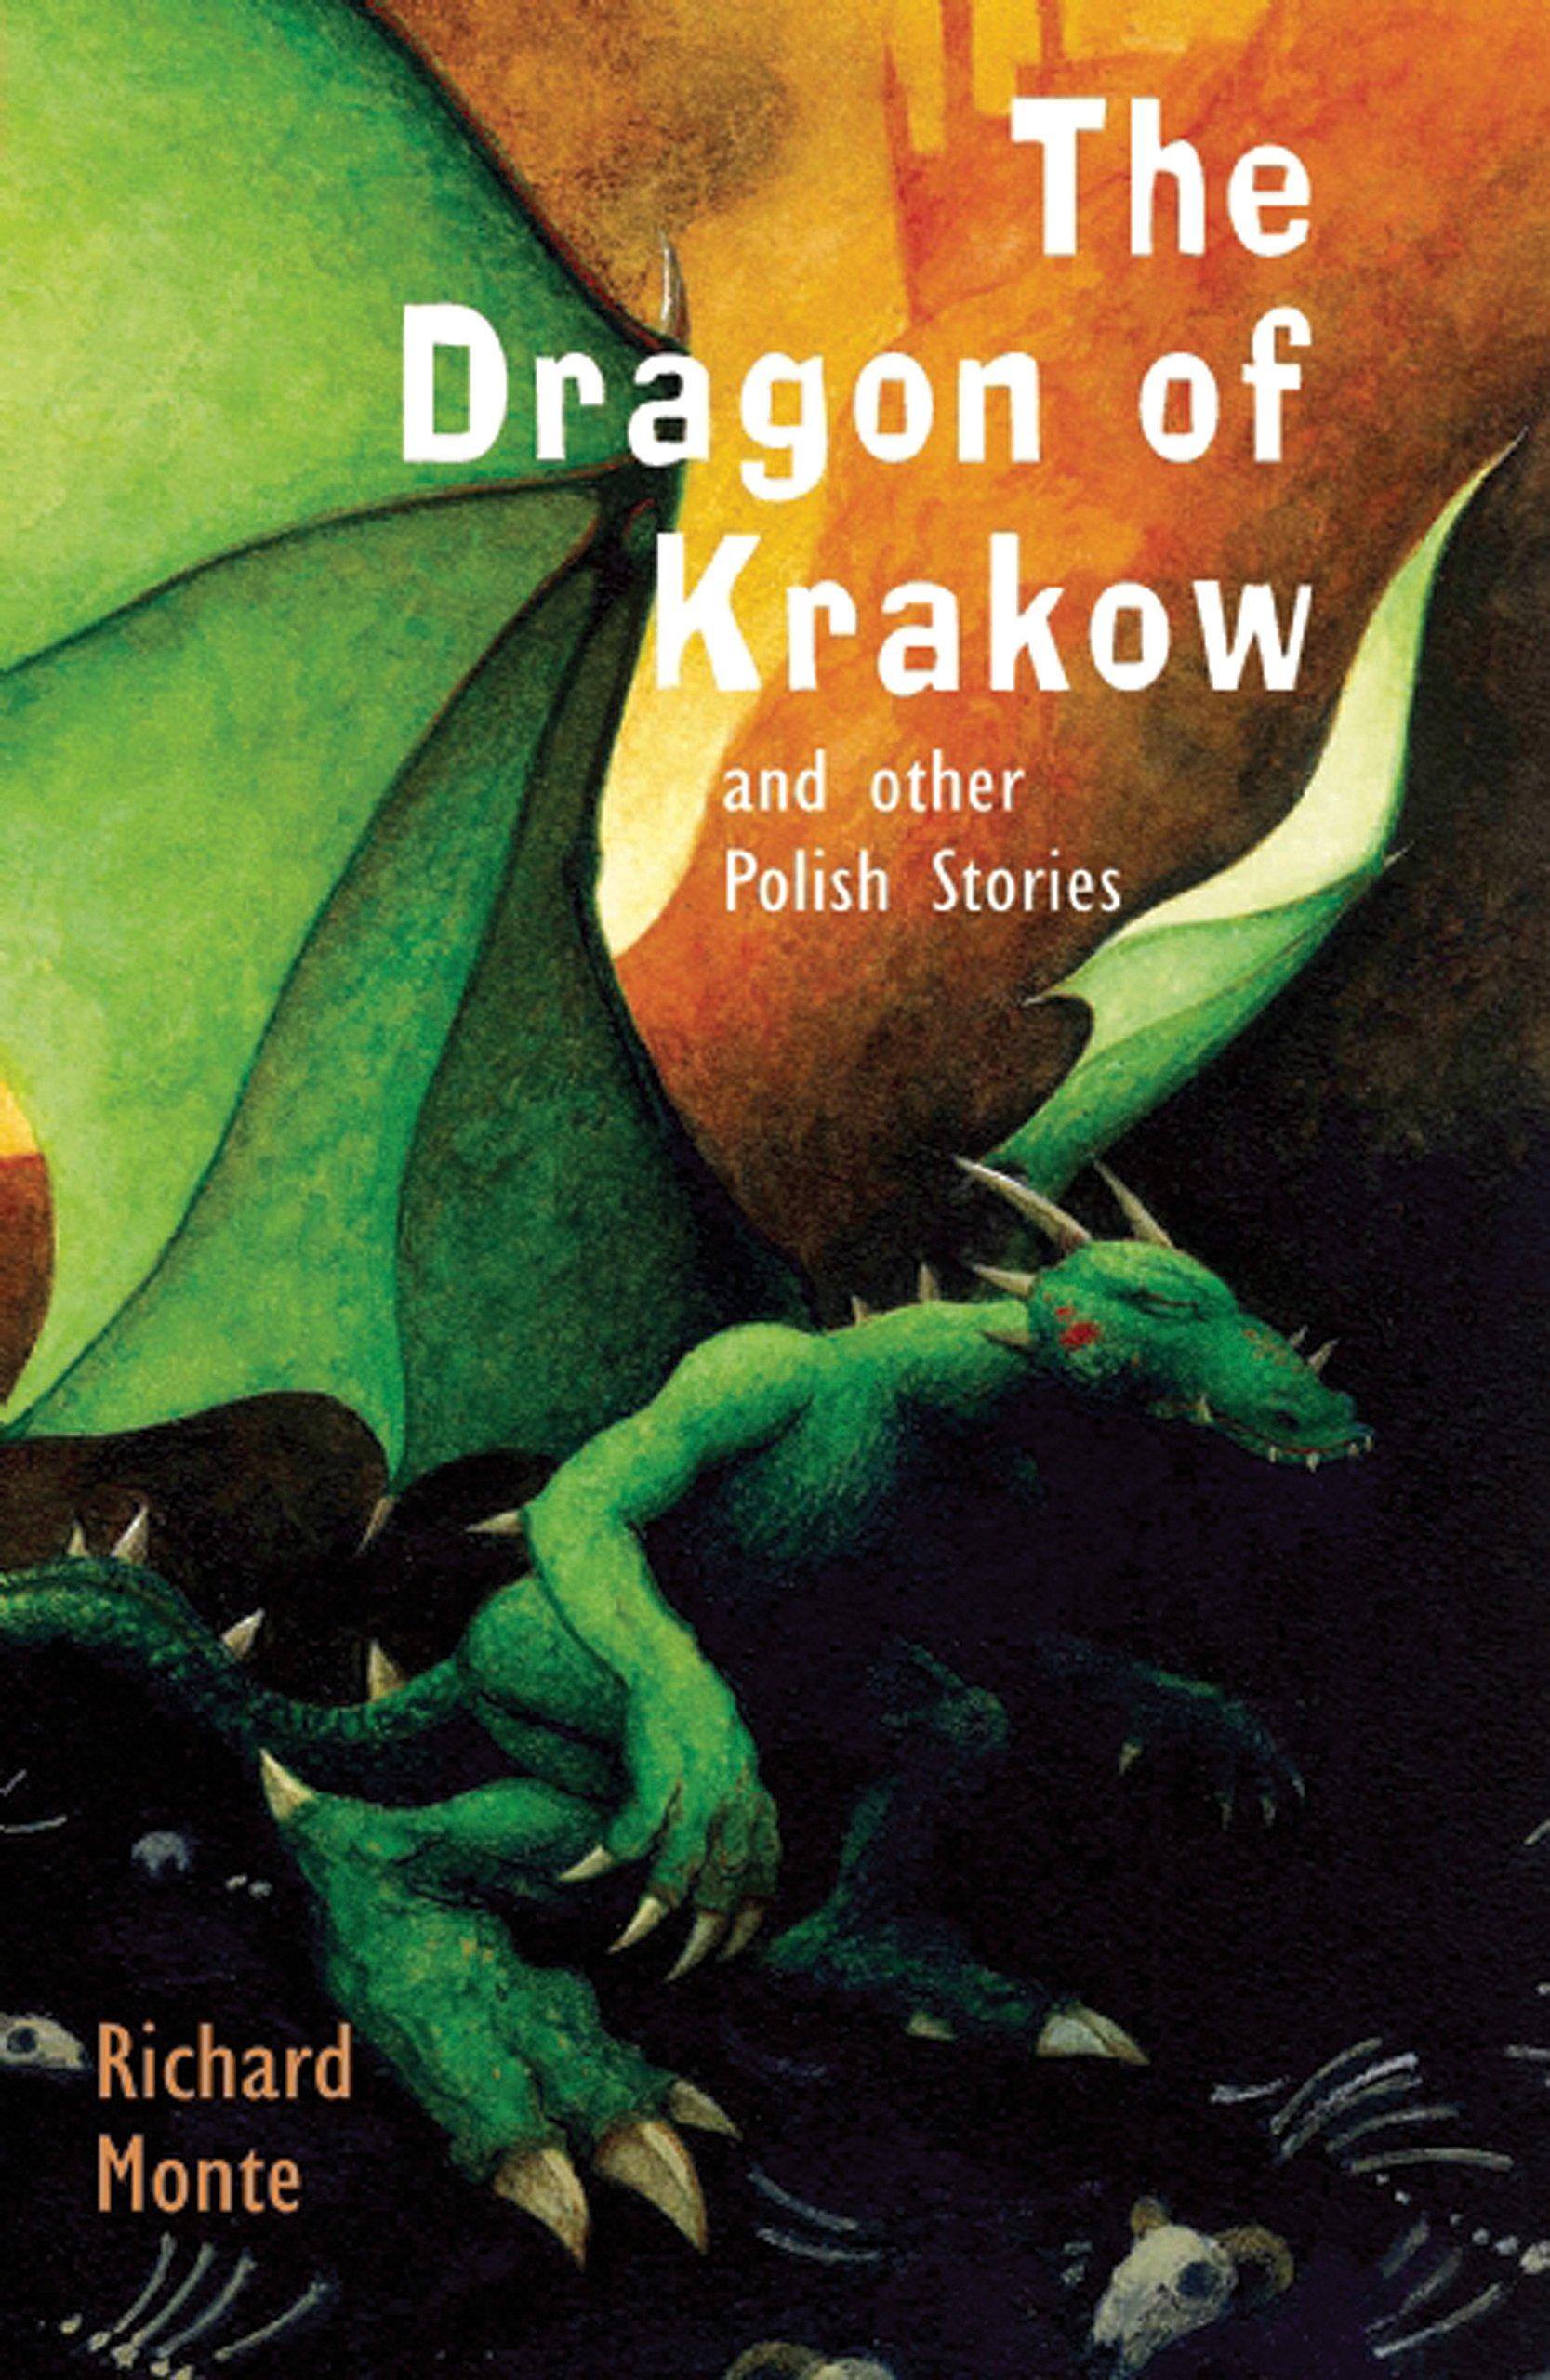 The Dragon of Krakow: and other Polish Stories: Amazon.co.uk: Monte, Mr  Richard, Hess, Mr Paul: Books